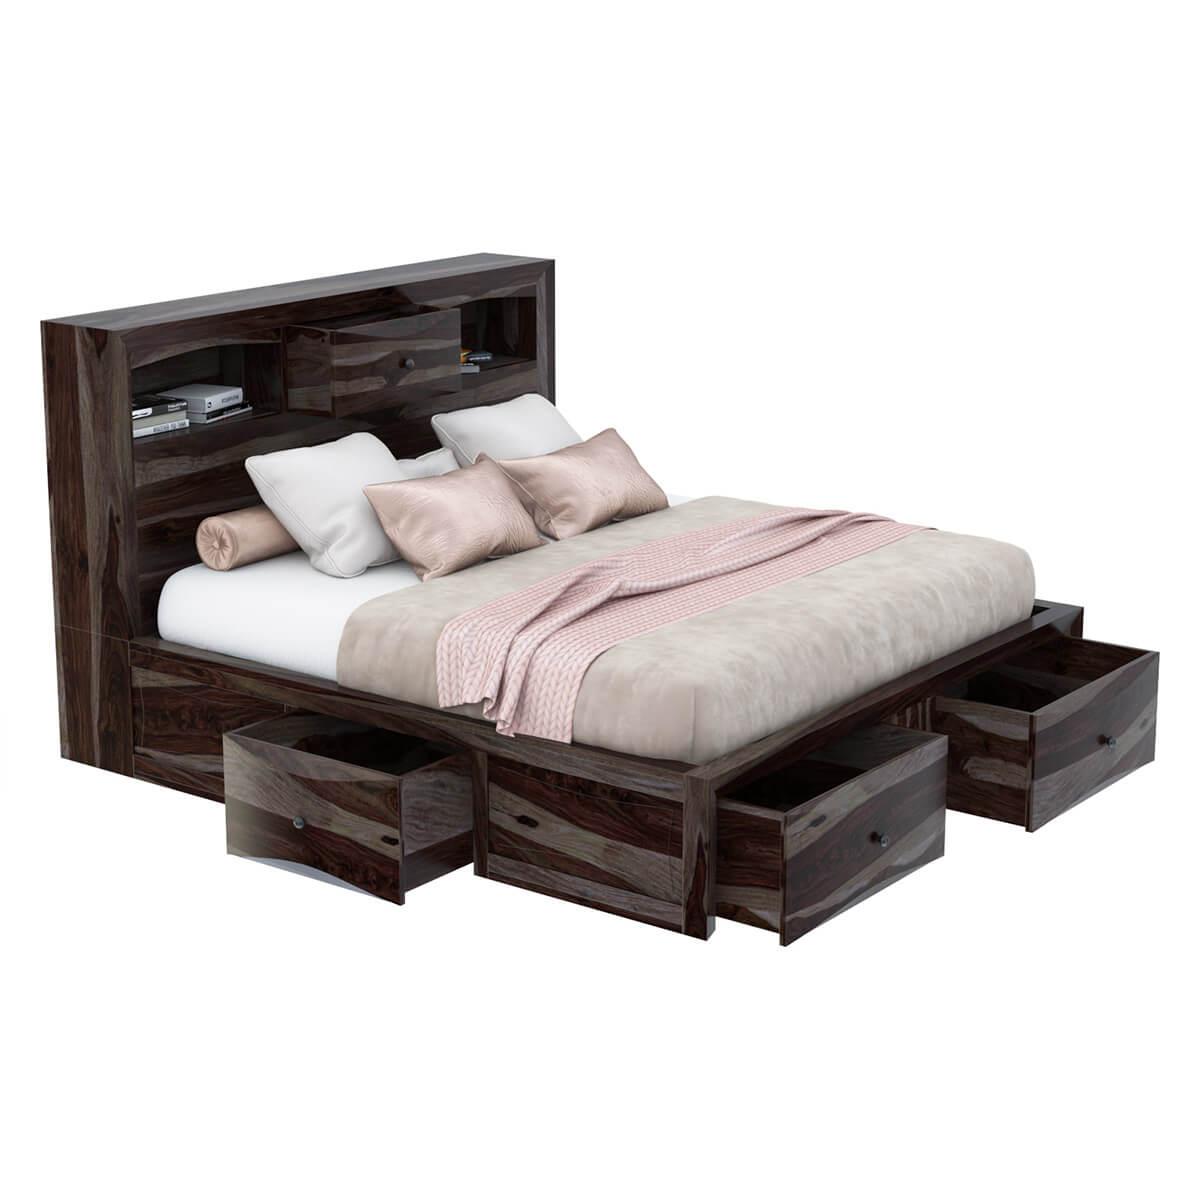 Modern Pioneer Solid Wood King Storage Captains Bed